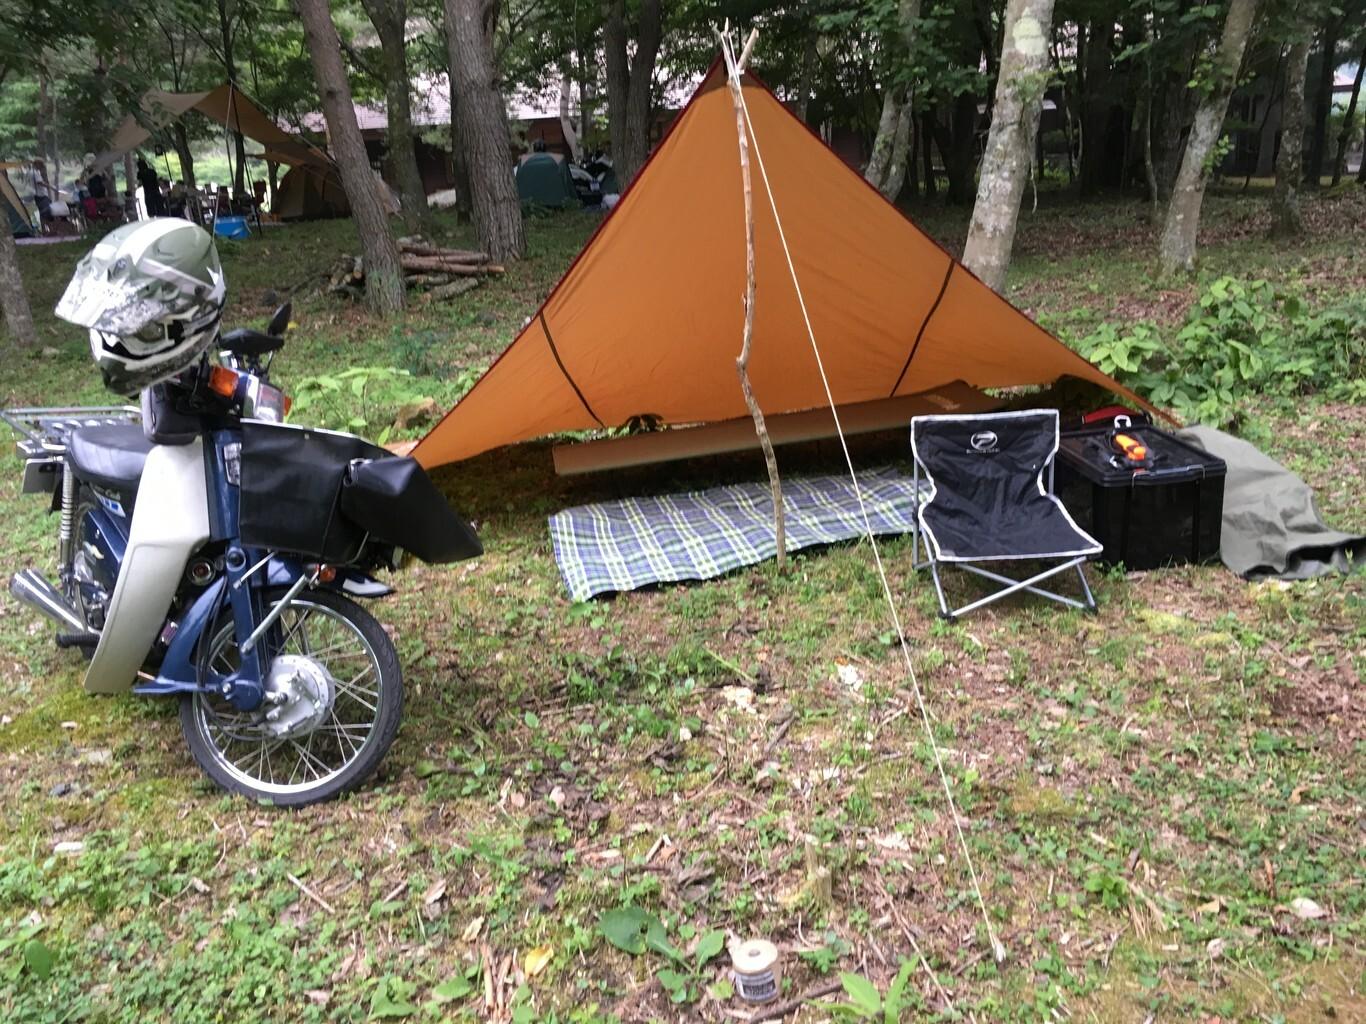 CAMP AKAIKE(キャンプ アカイケ) の写真p7576